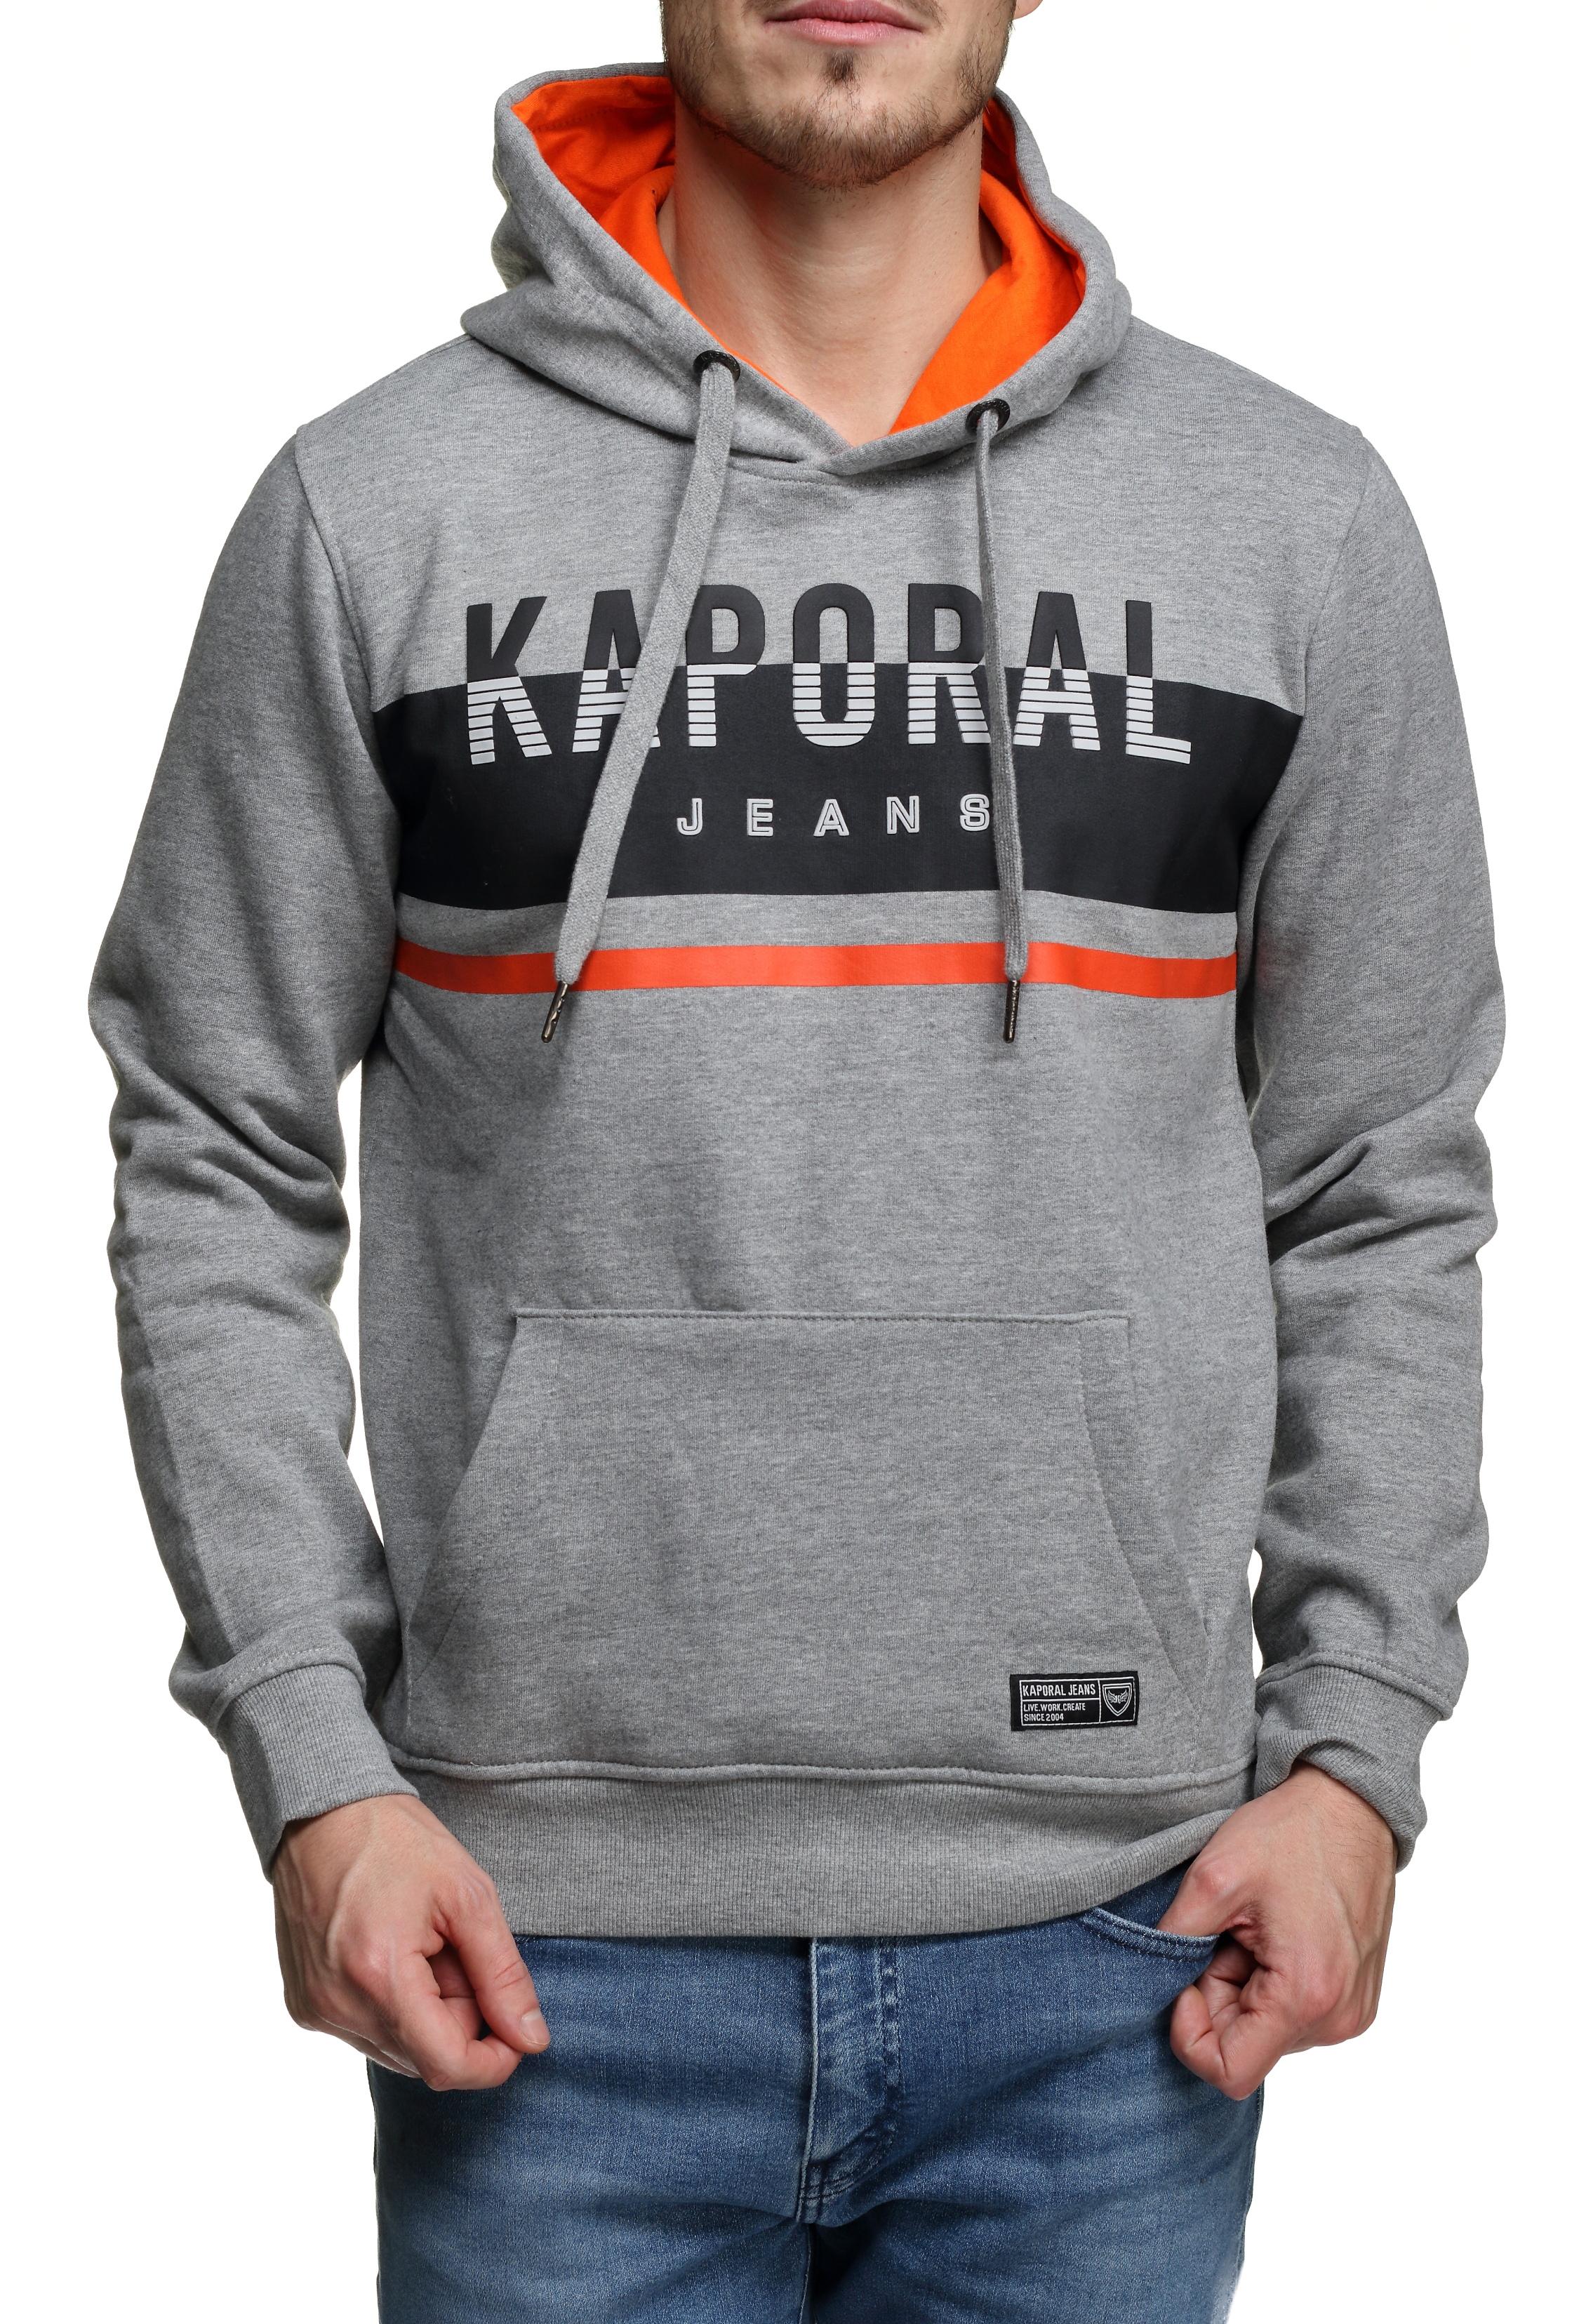 https://www.leadermode.com/197817/kaporal-volak-medium-grey.jpg